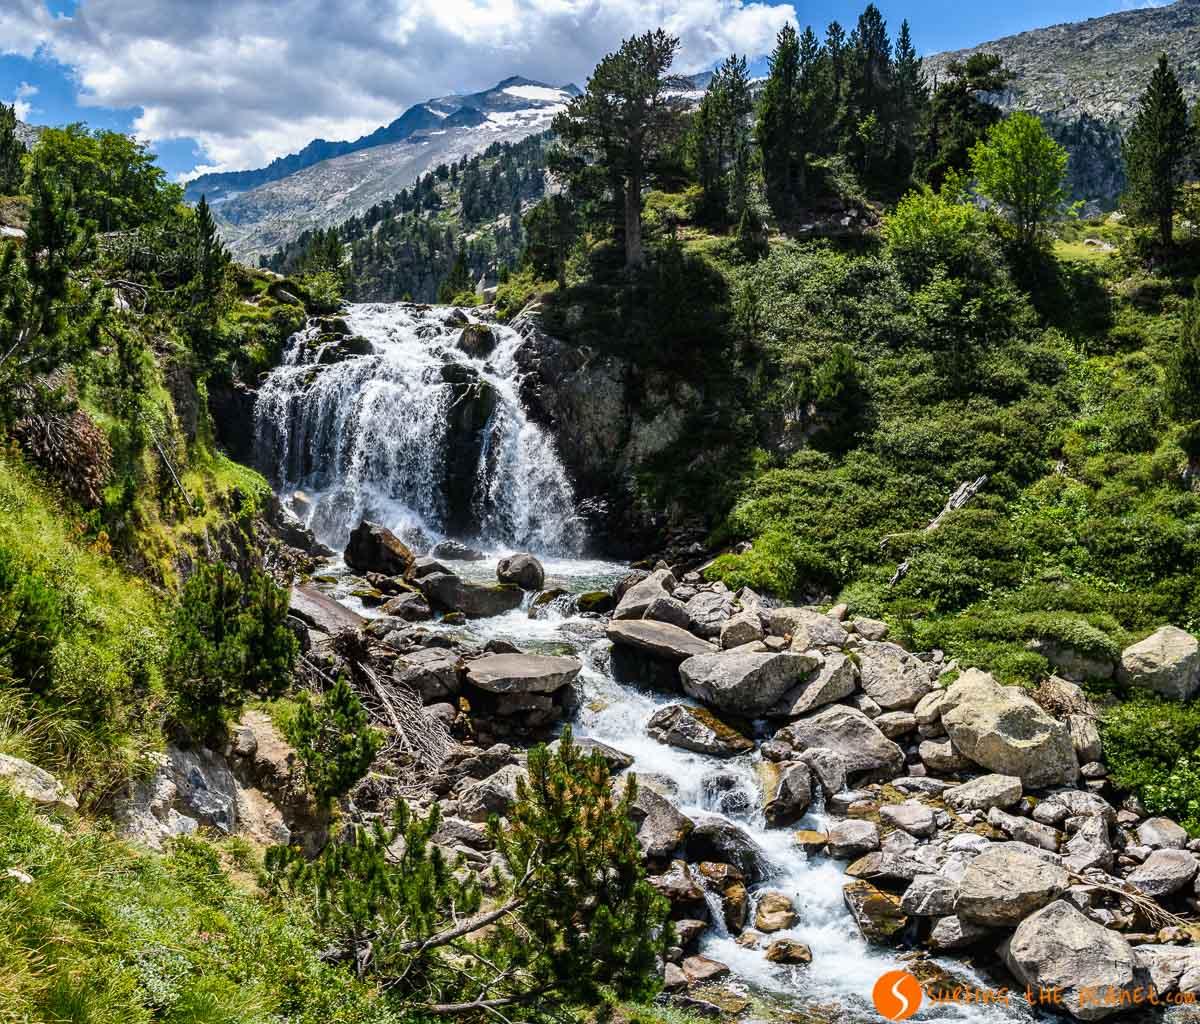 Cascada de Forau Aiguallut, Huesca, Aragón | Qué ver en la Provincia de Huesca